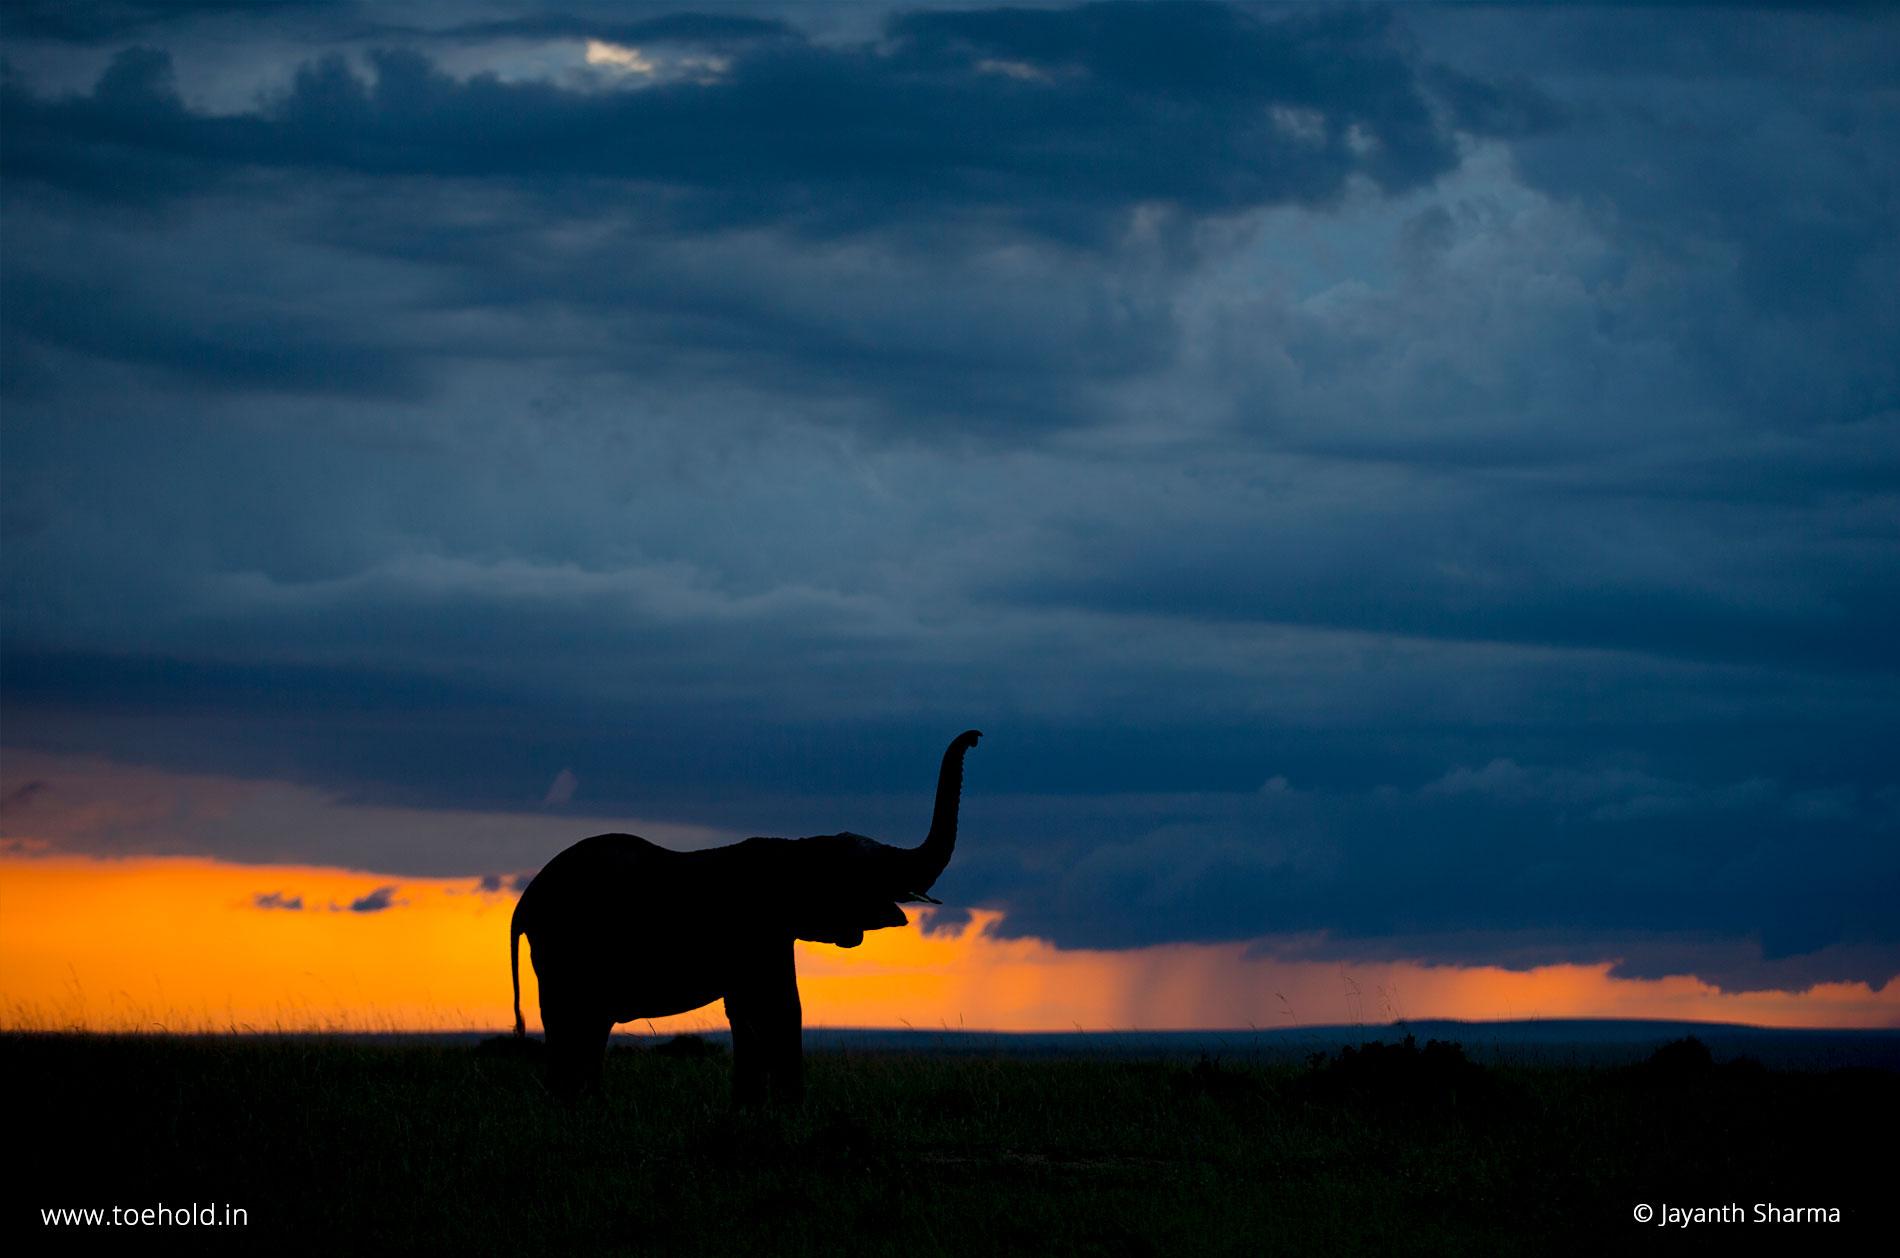 1 elephant silhouette mara 2021